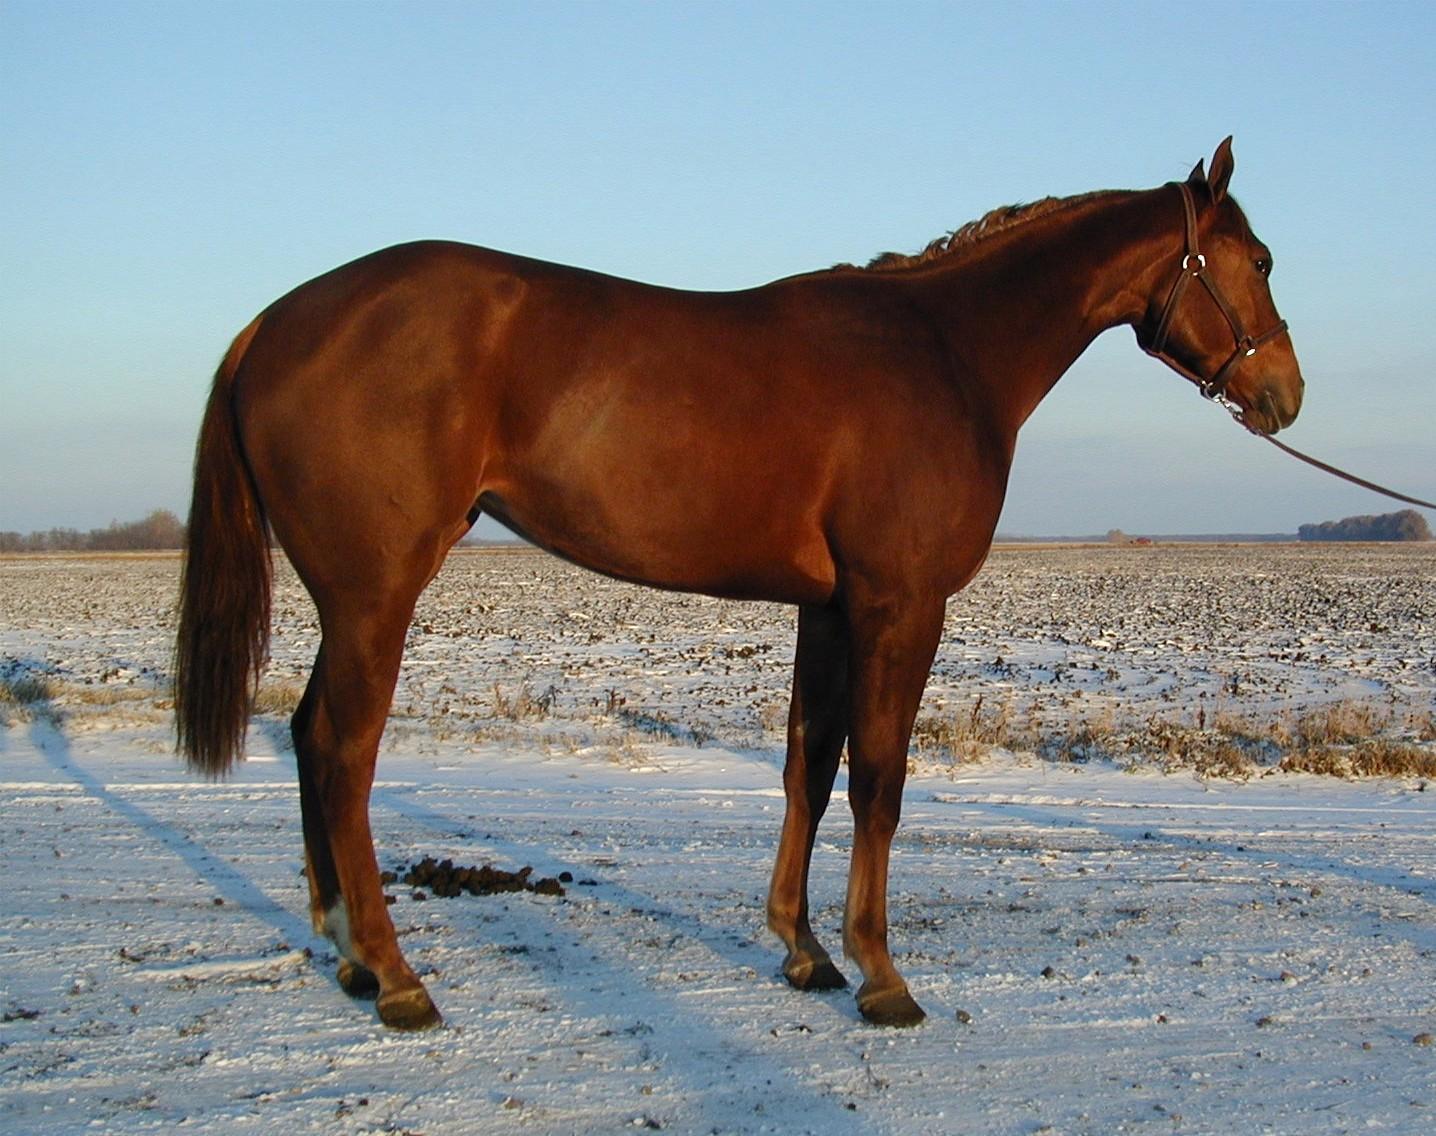 Denvers Boo Tee 2000 AQHA sorrel mare